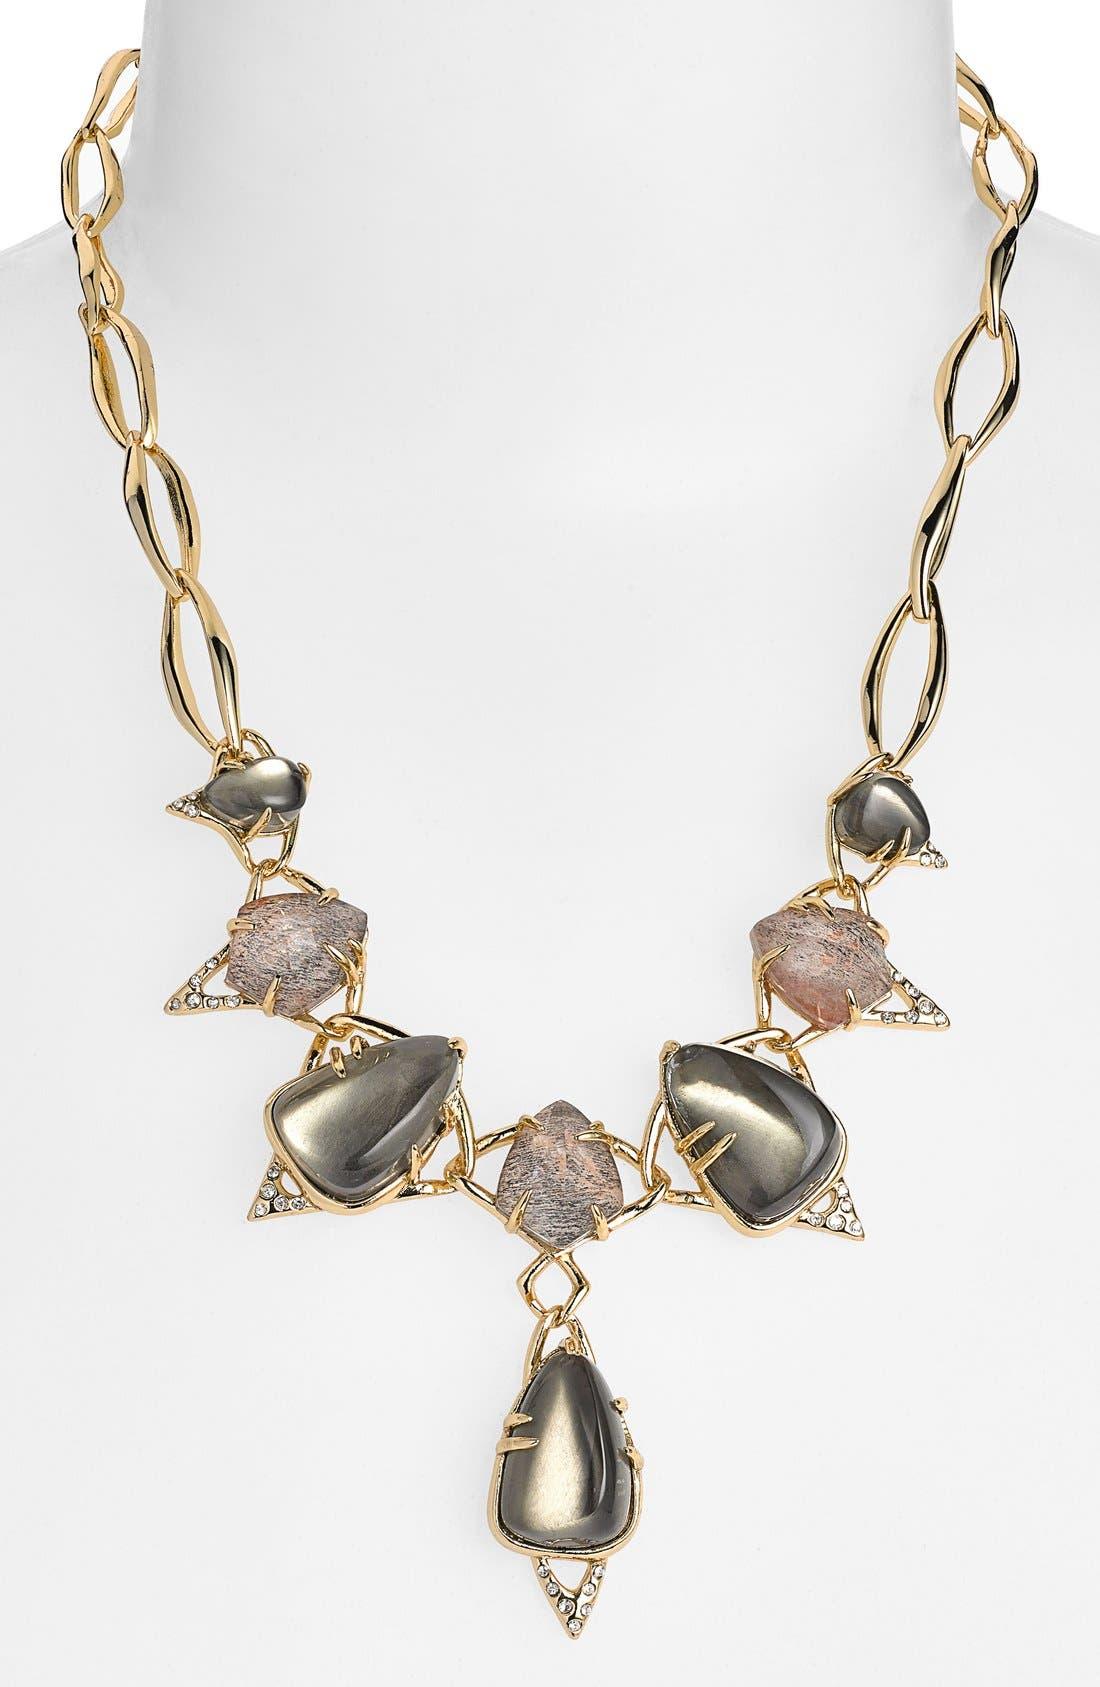 Main Image - Alexis Bittar 'Miss Havisham - Kinetic Gold' Frontal Necklace